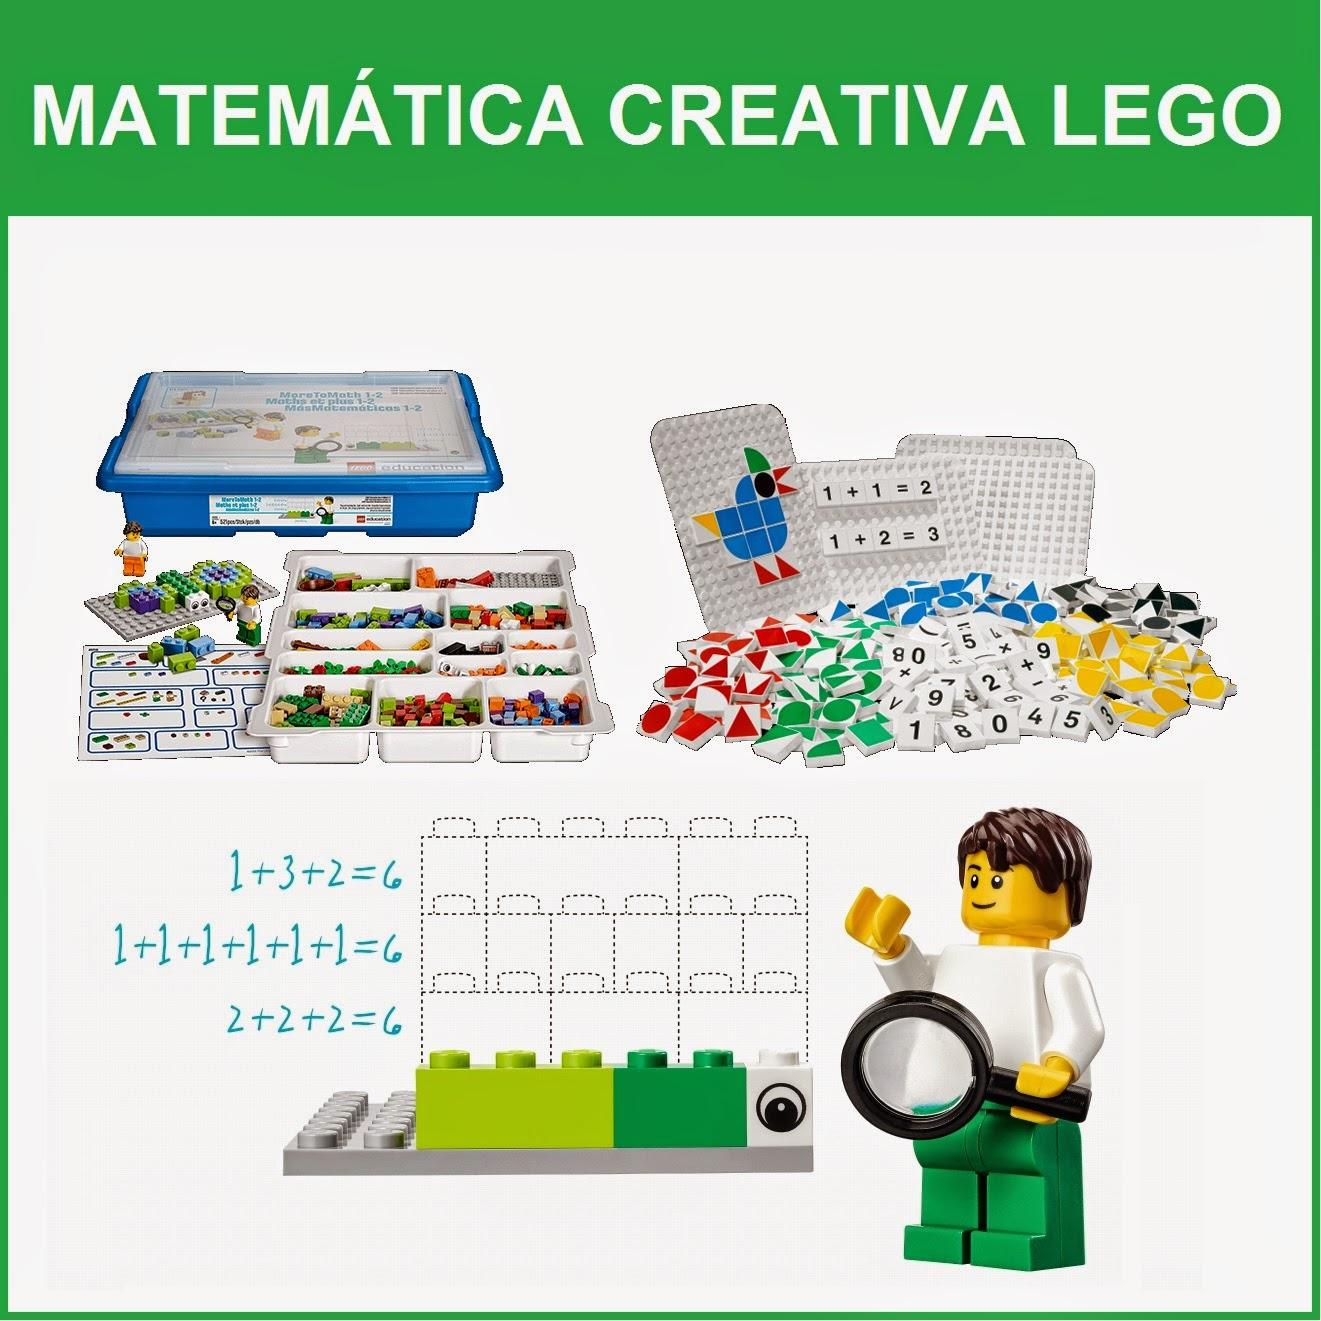 Matemática Creativa Lego